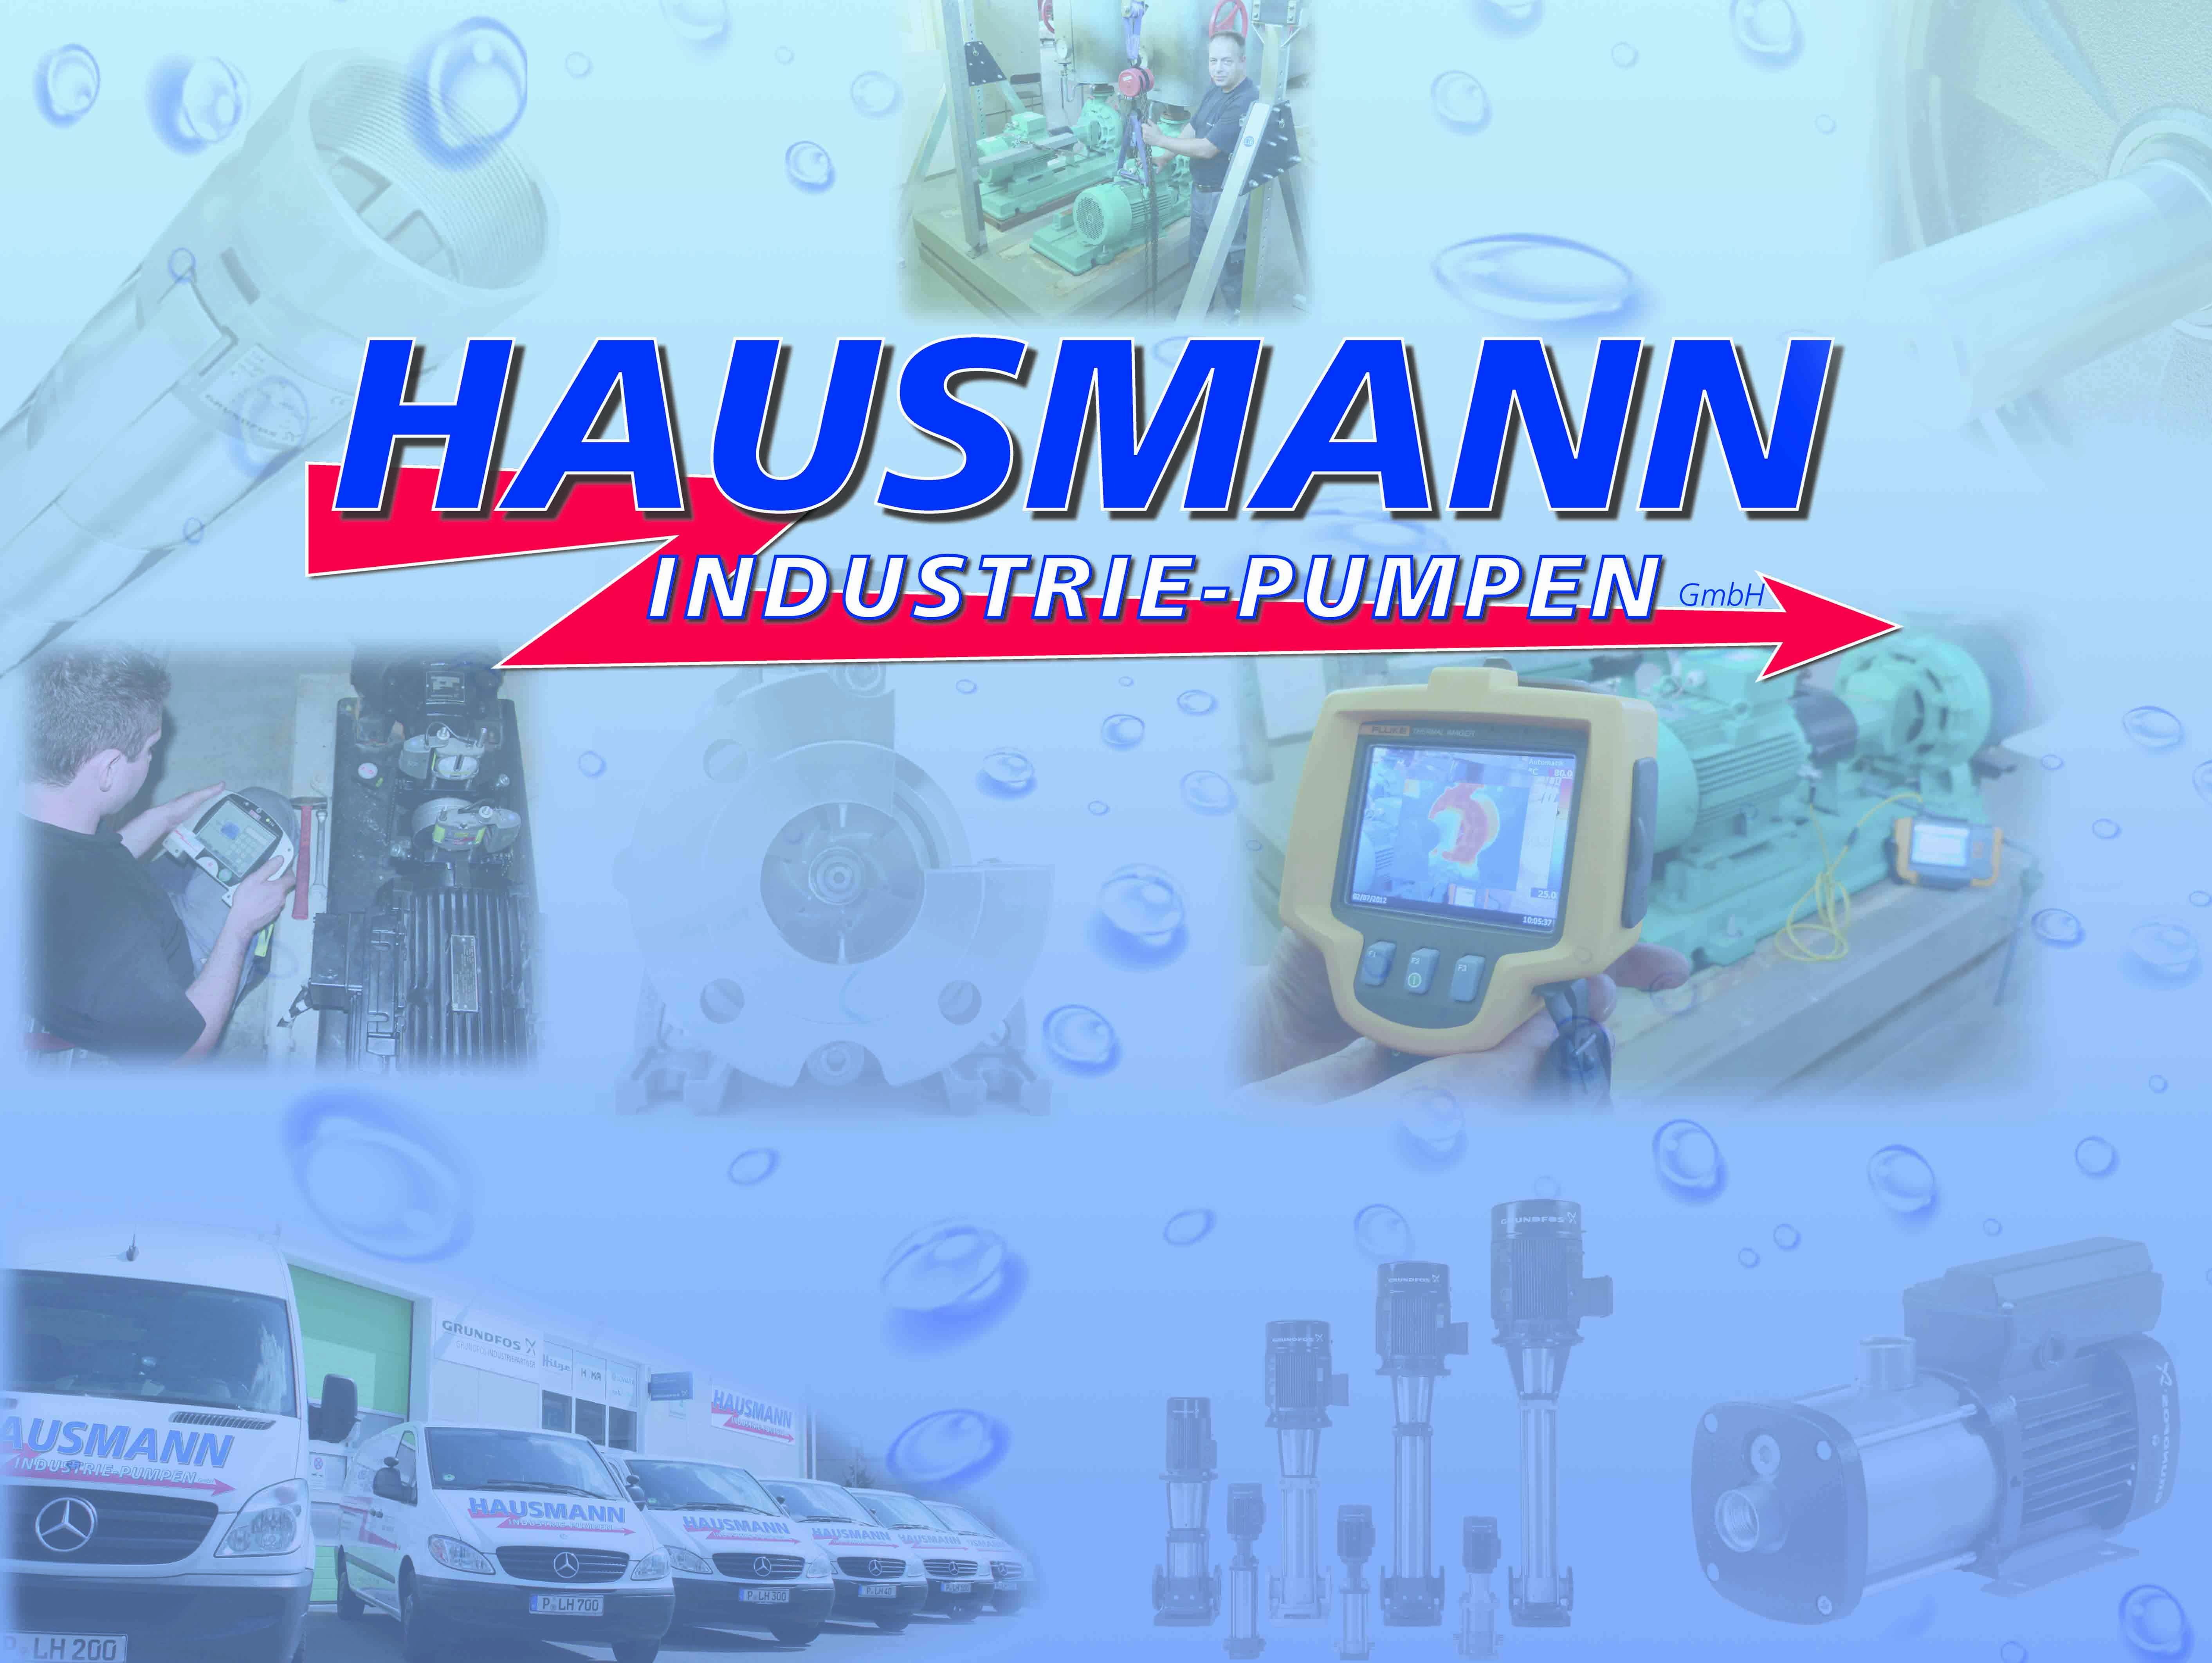 Hausmann Industrie-Pumpen GmbH